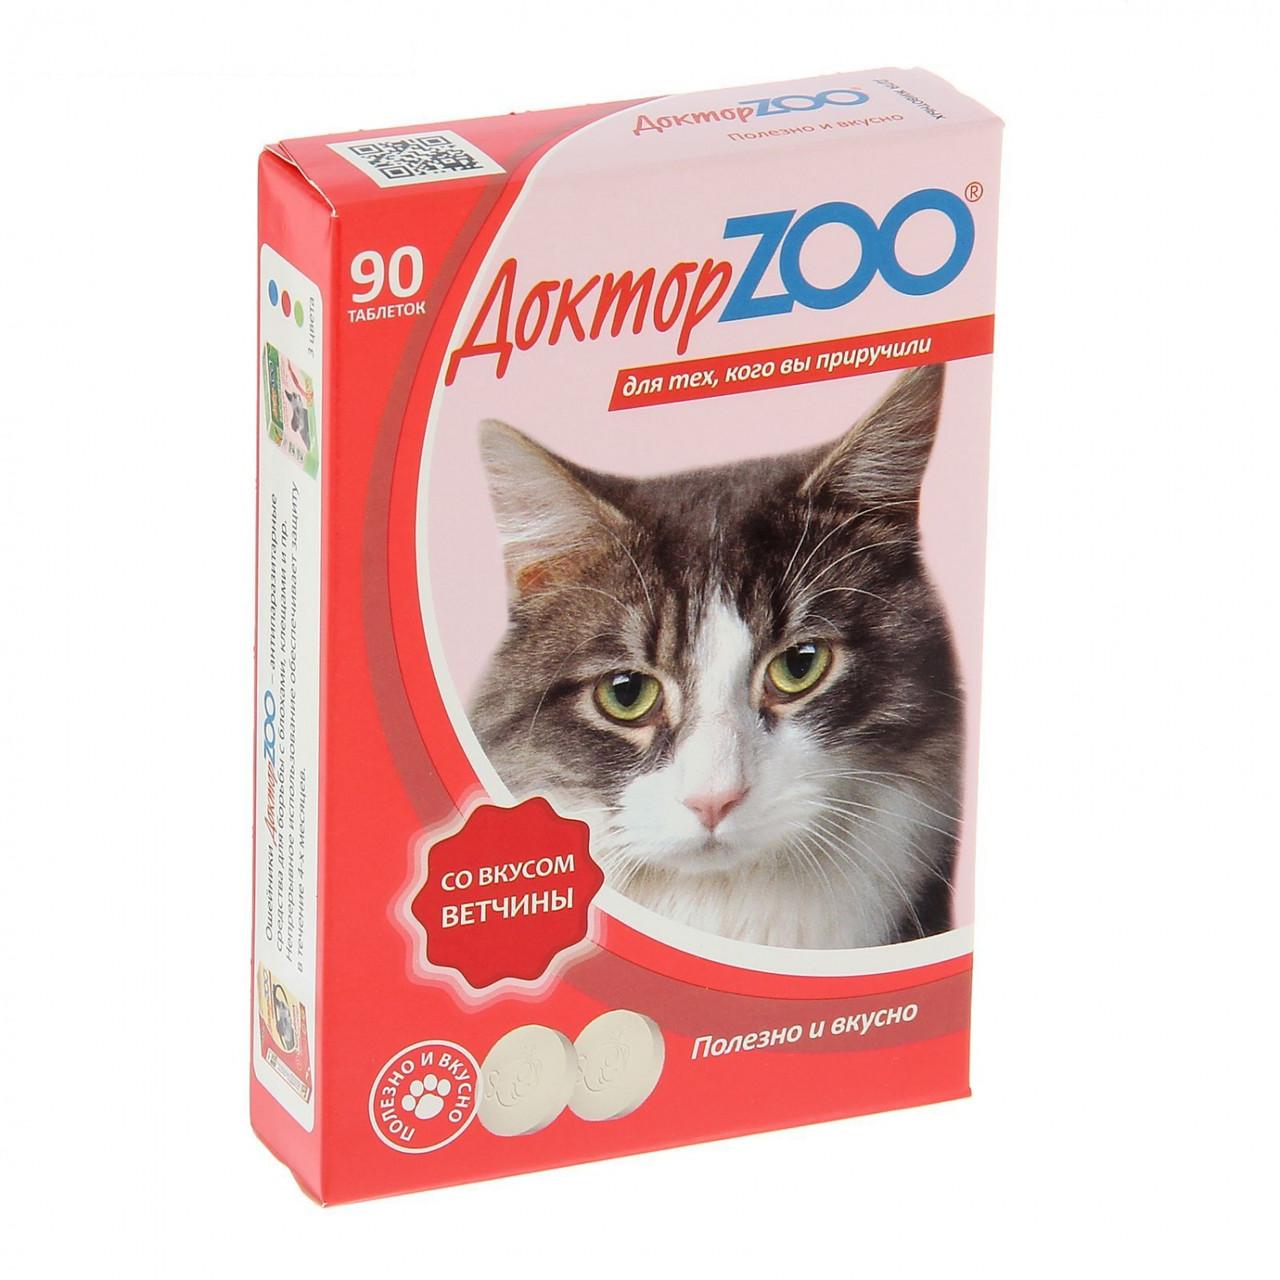 Витаминное лакомство для кошек Доктор ZOO со вкусом ветчины